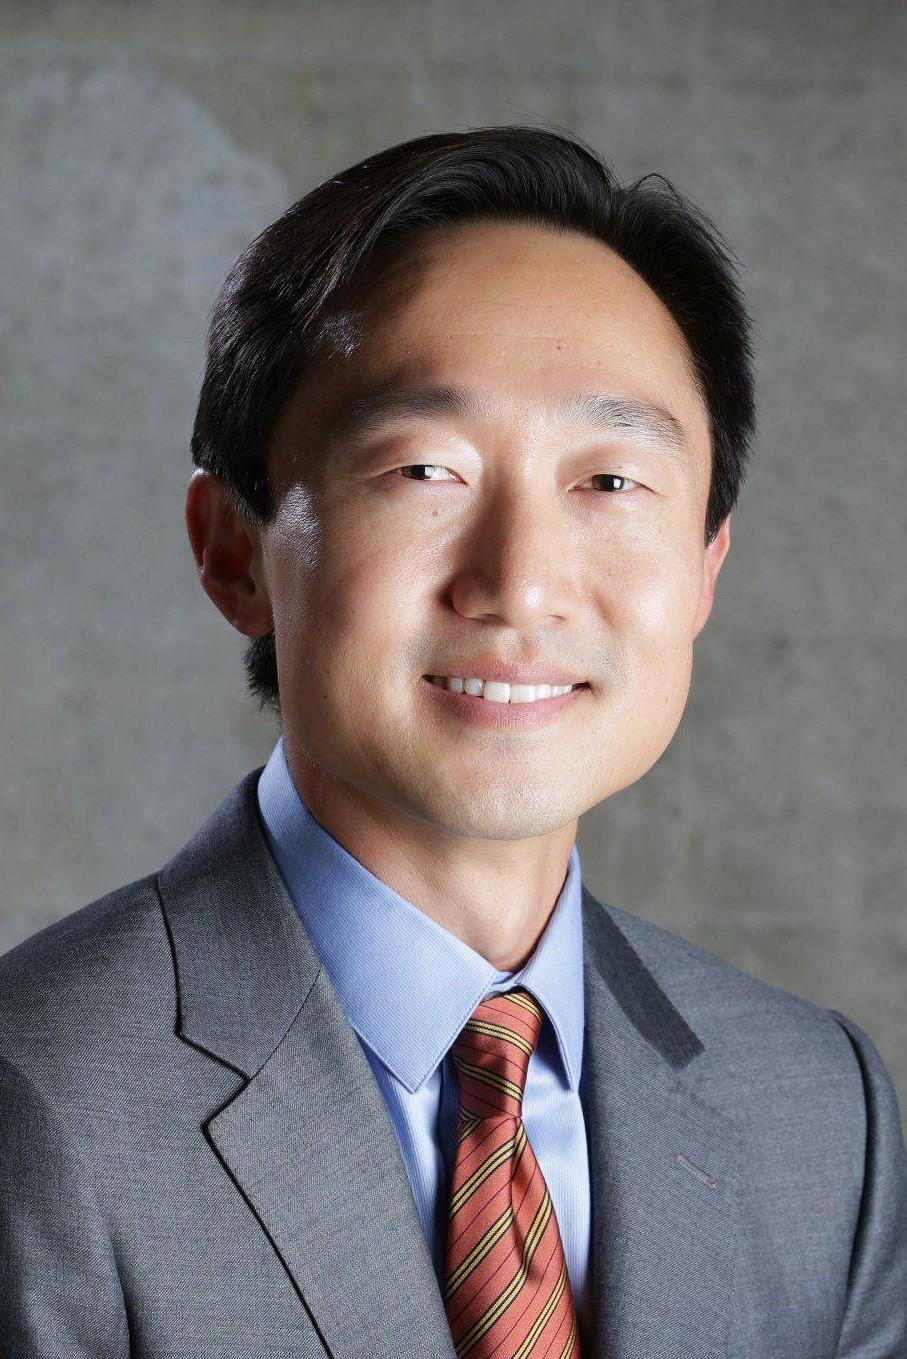 Doctor Kim